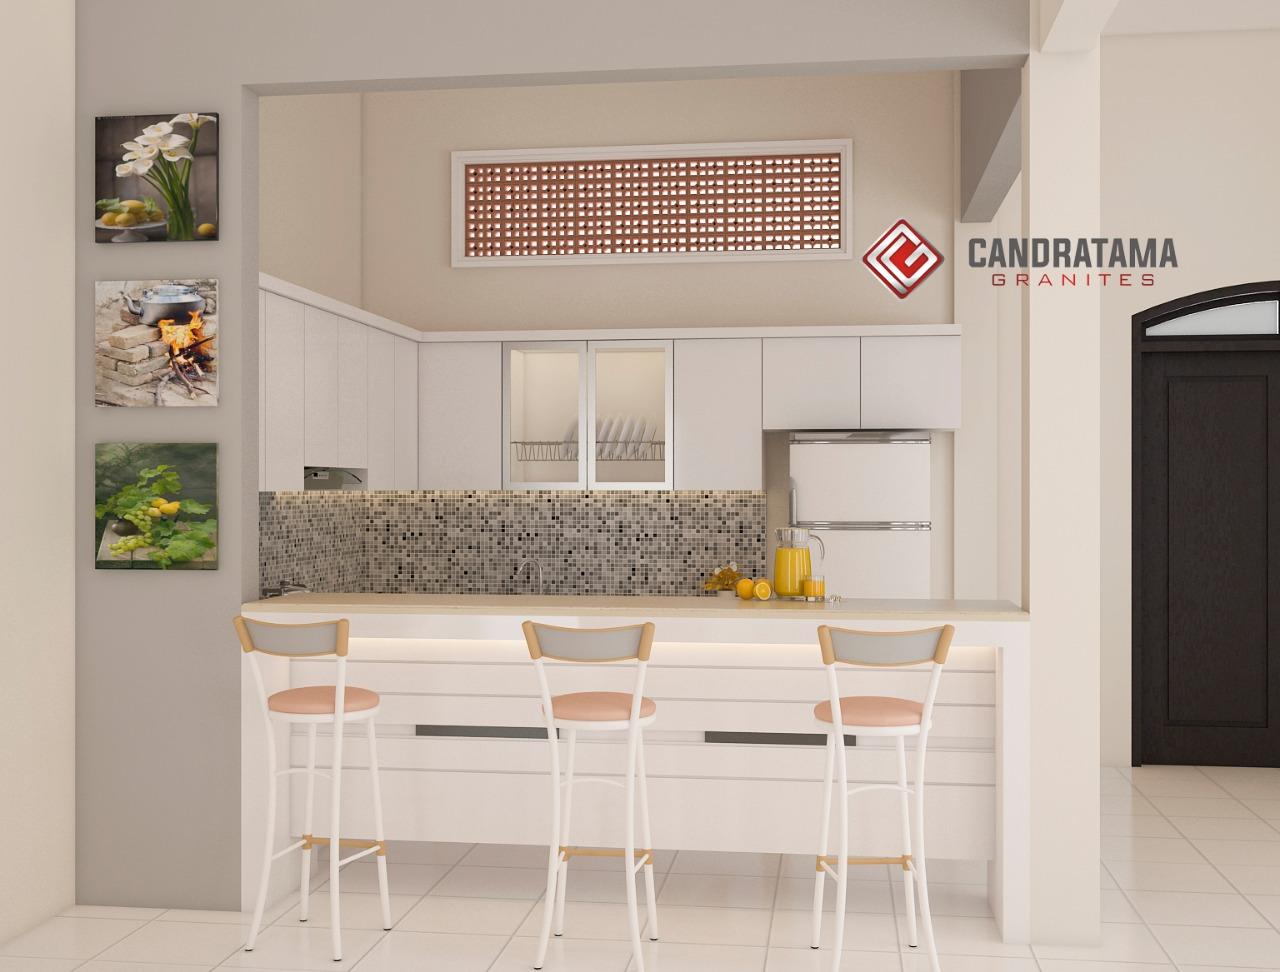 Kegunaan Desain Dapur Ala Mini Bar Yang Jarang Diketahui Di Fakfak